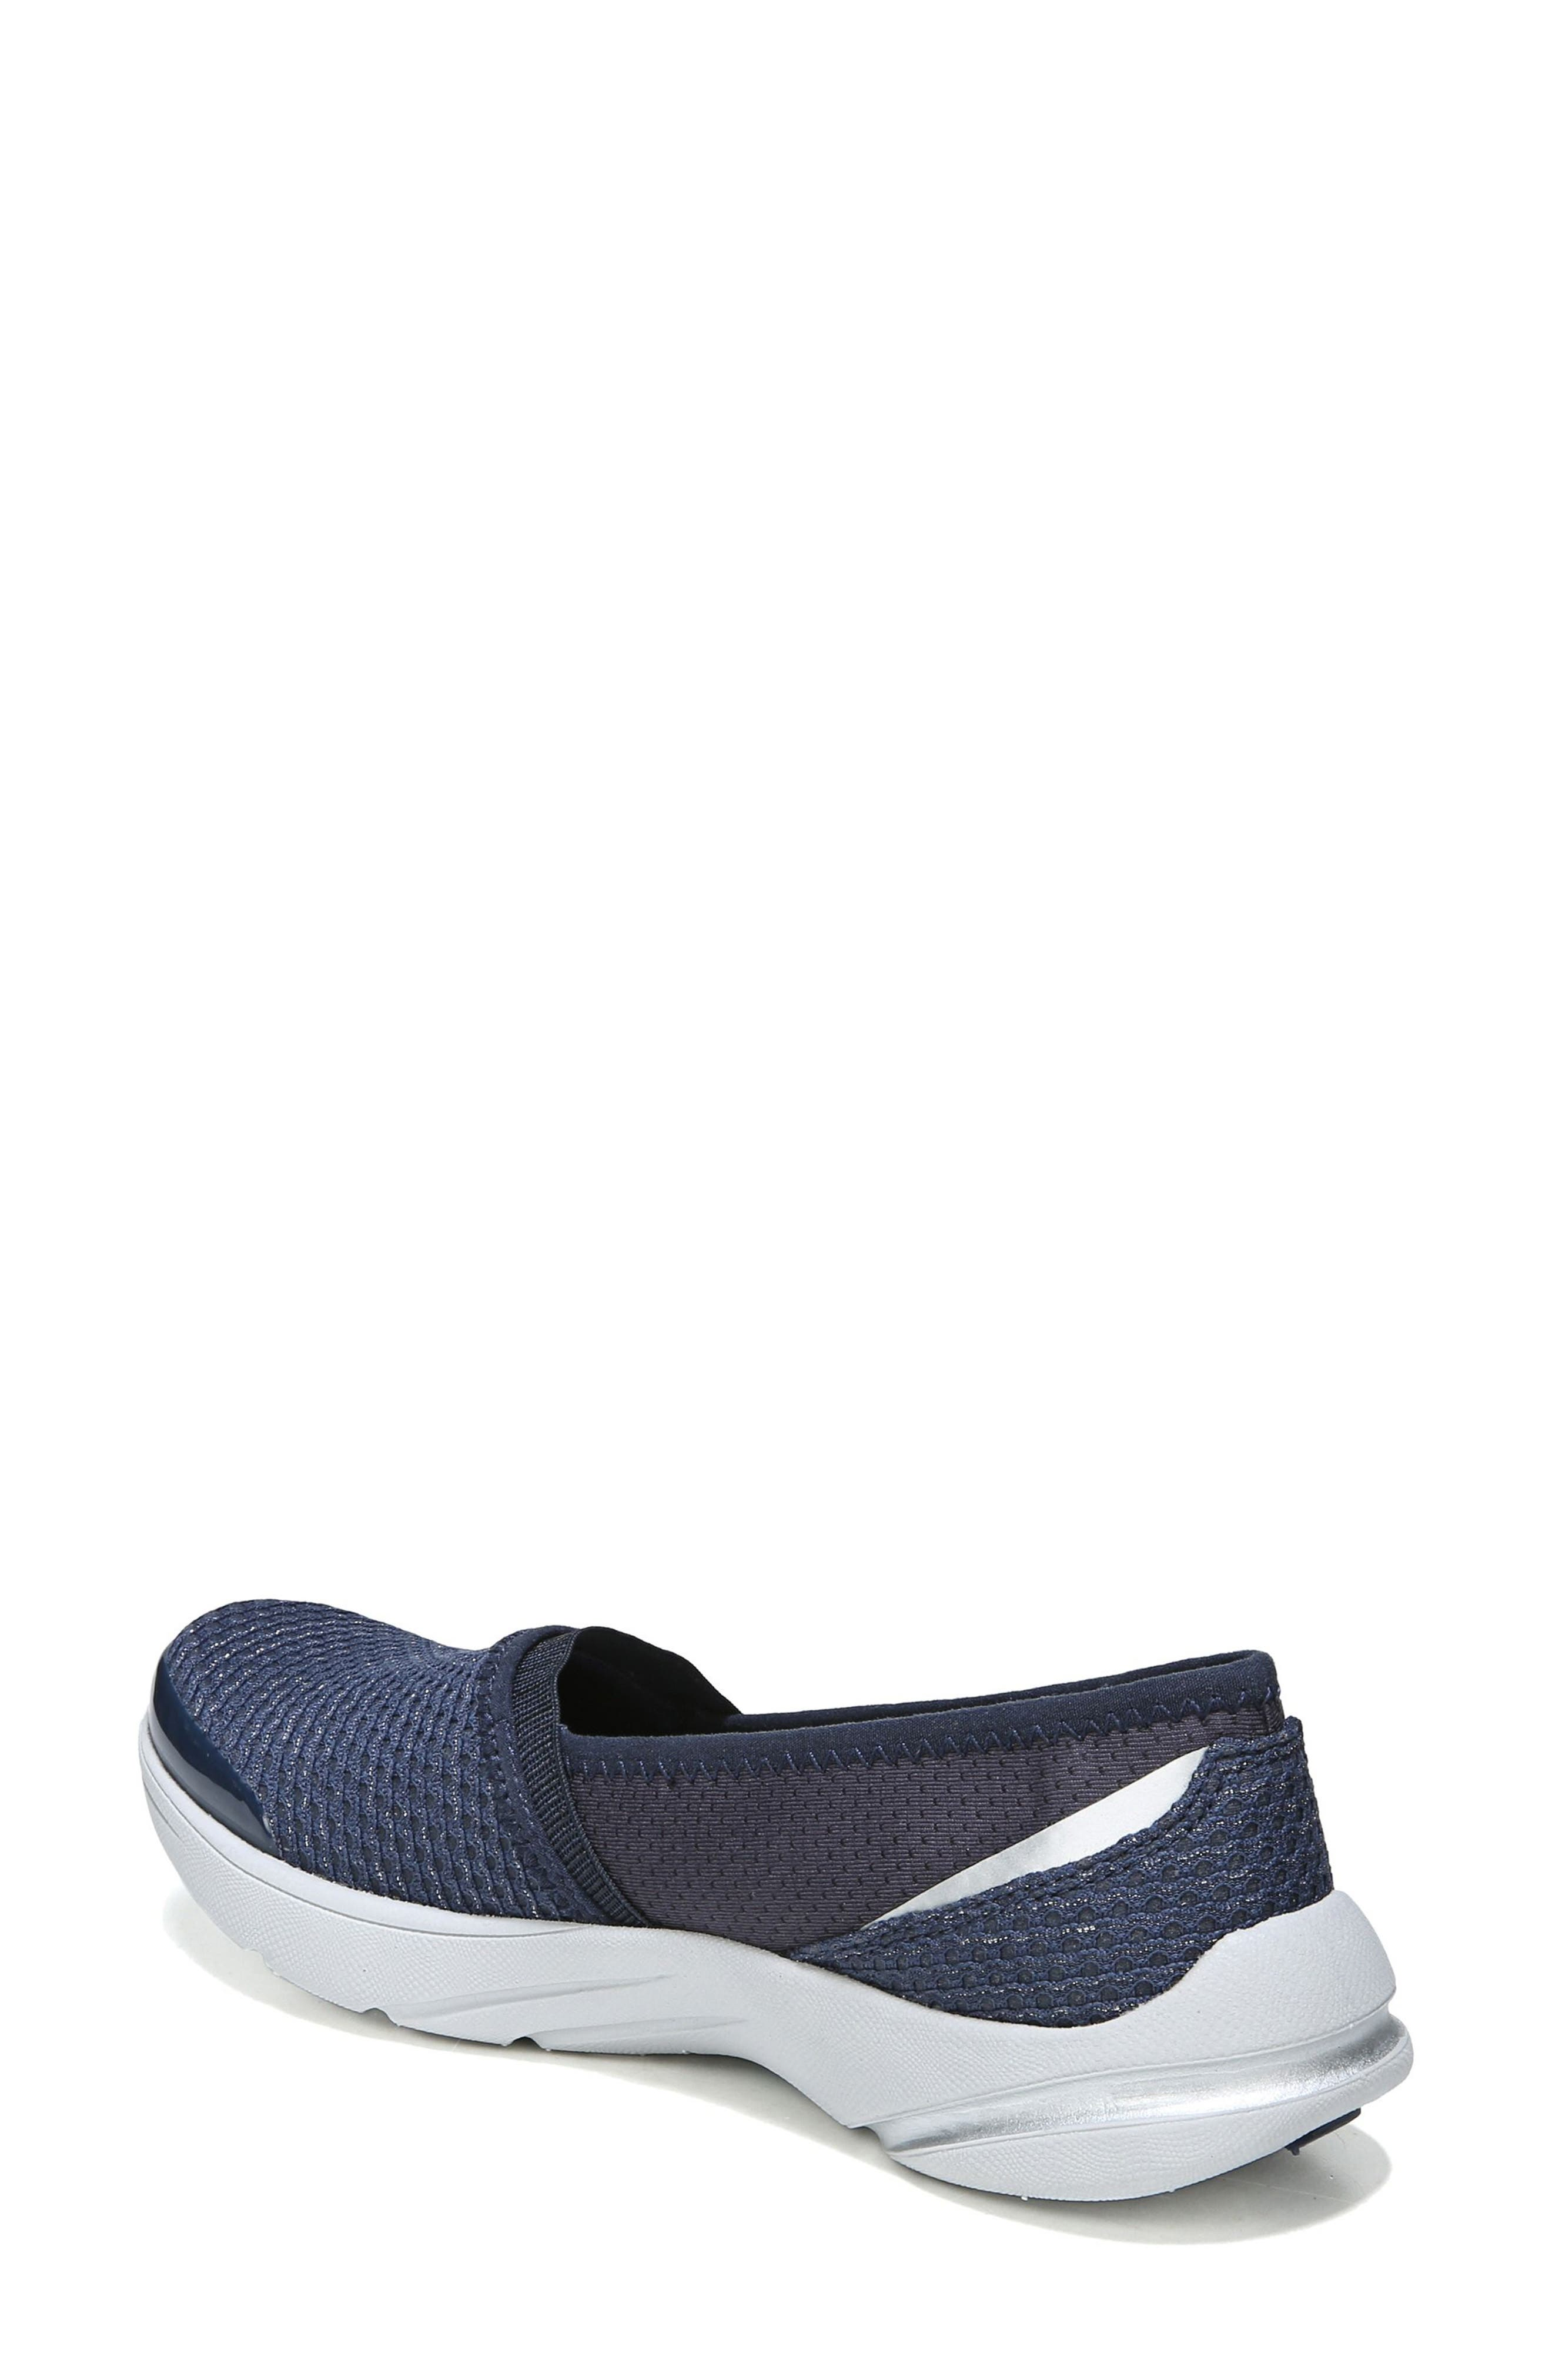 Alternate Image 2  - BZees Lollipop Slip-On Sneaker (Women)